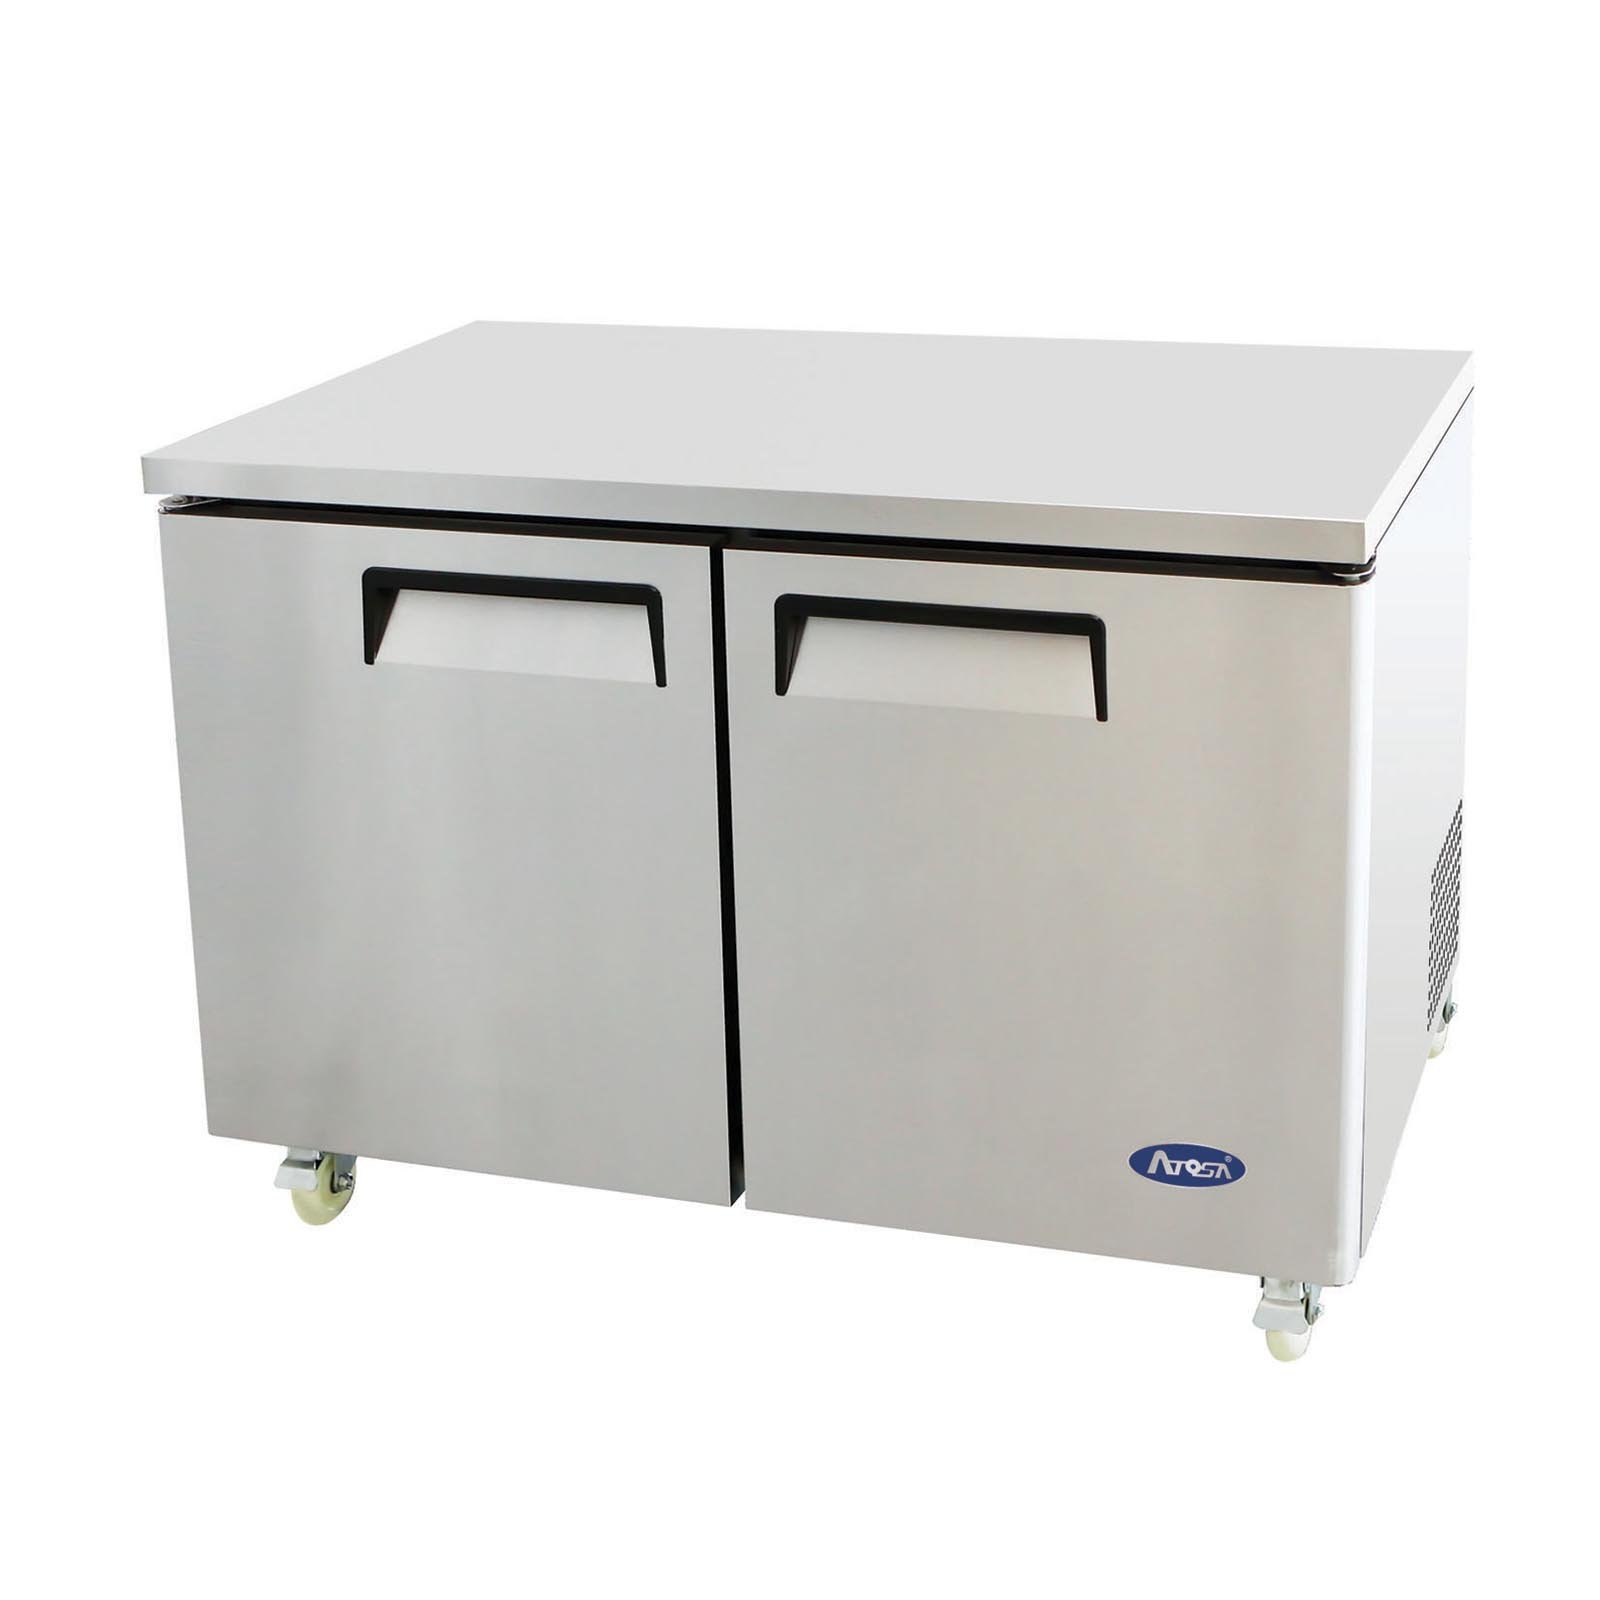 Atosa Usa MGF8402 Stainless Steel Undercounter 48'' 2-Door Refrigerator